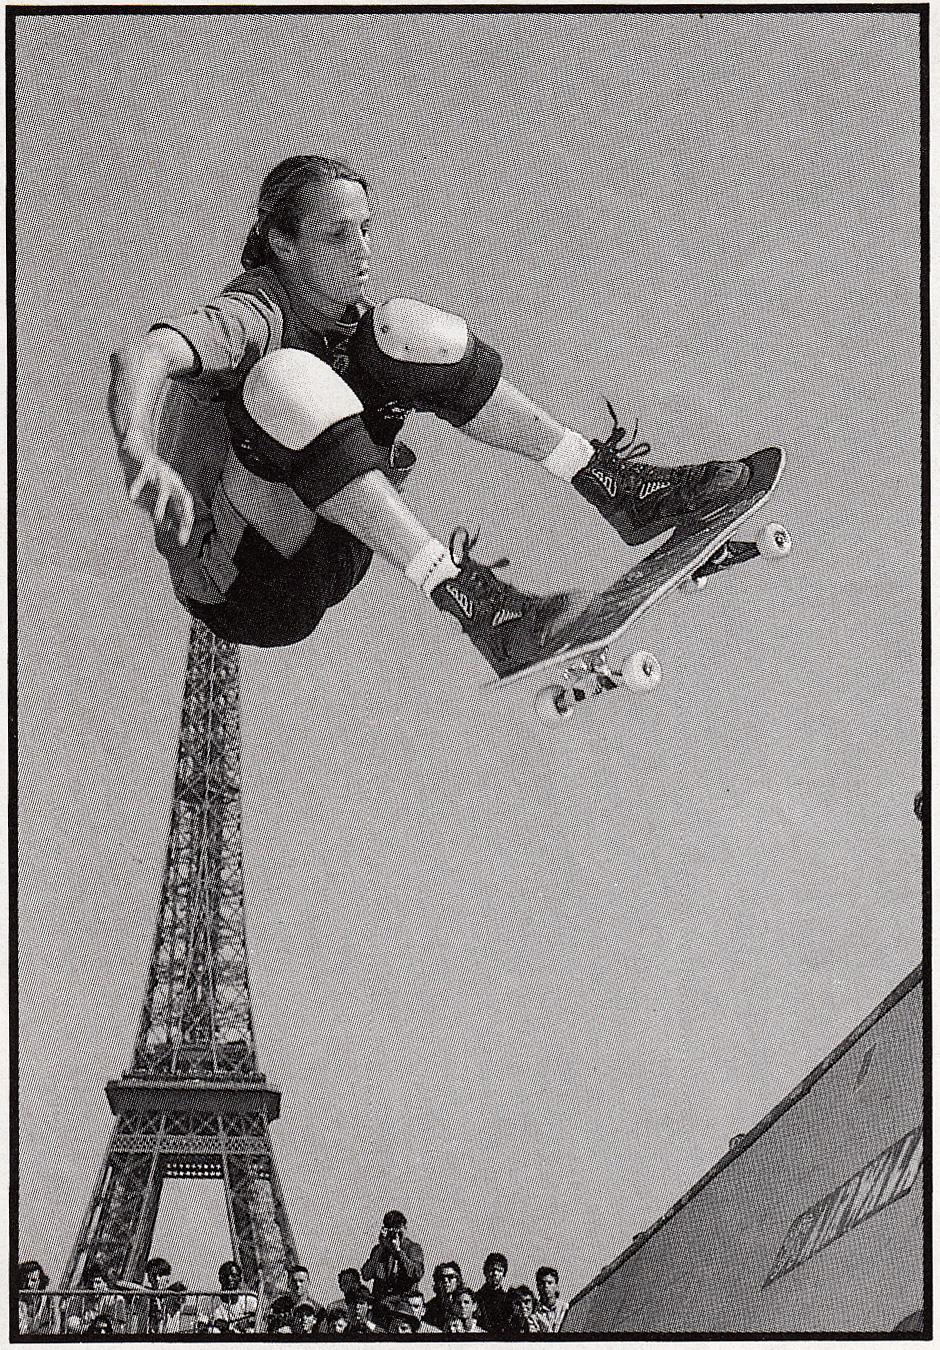 Further European exploration. Slam City Skates Founder and total legend Paul Sunman shot this photo of the Birdman in Paris